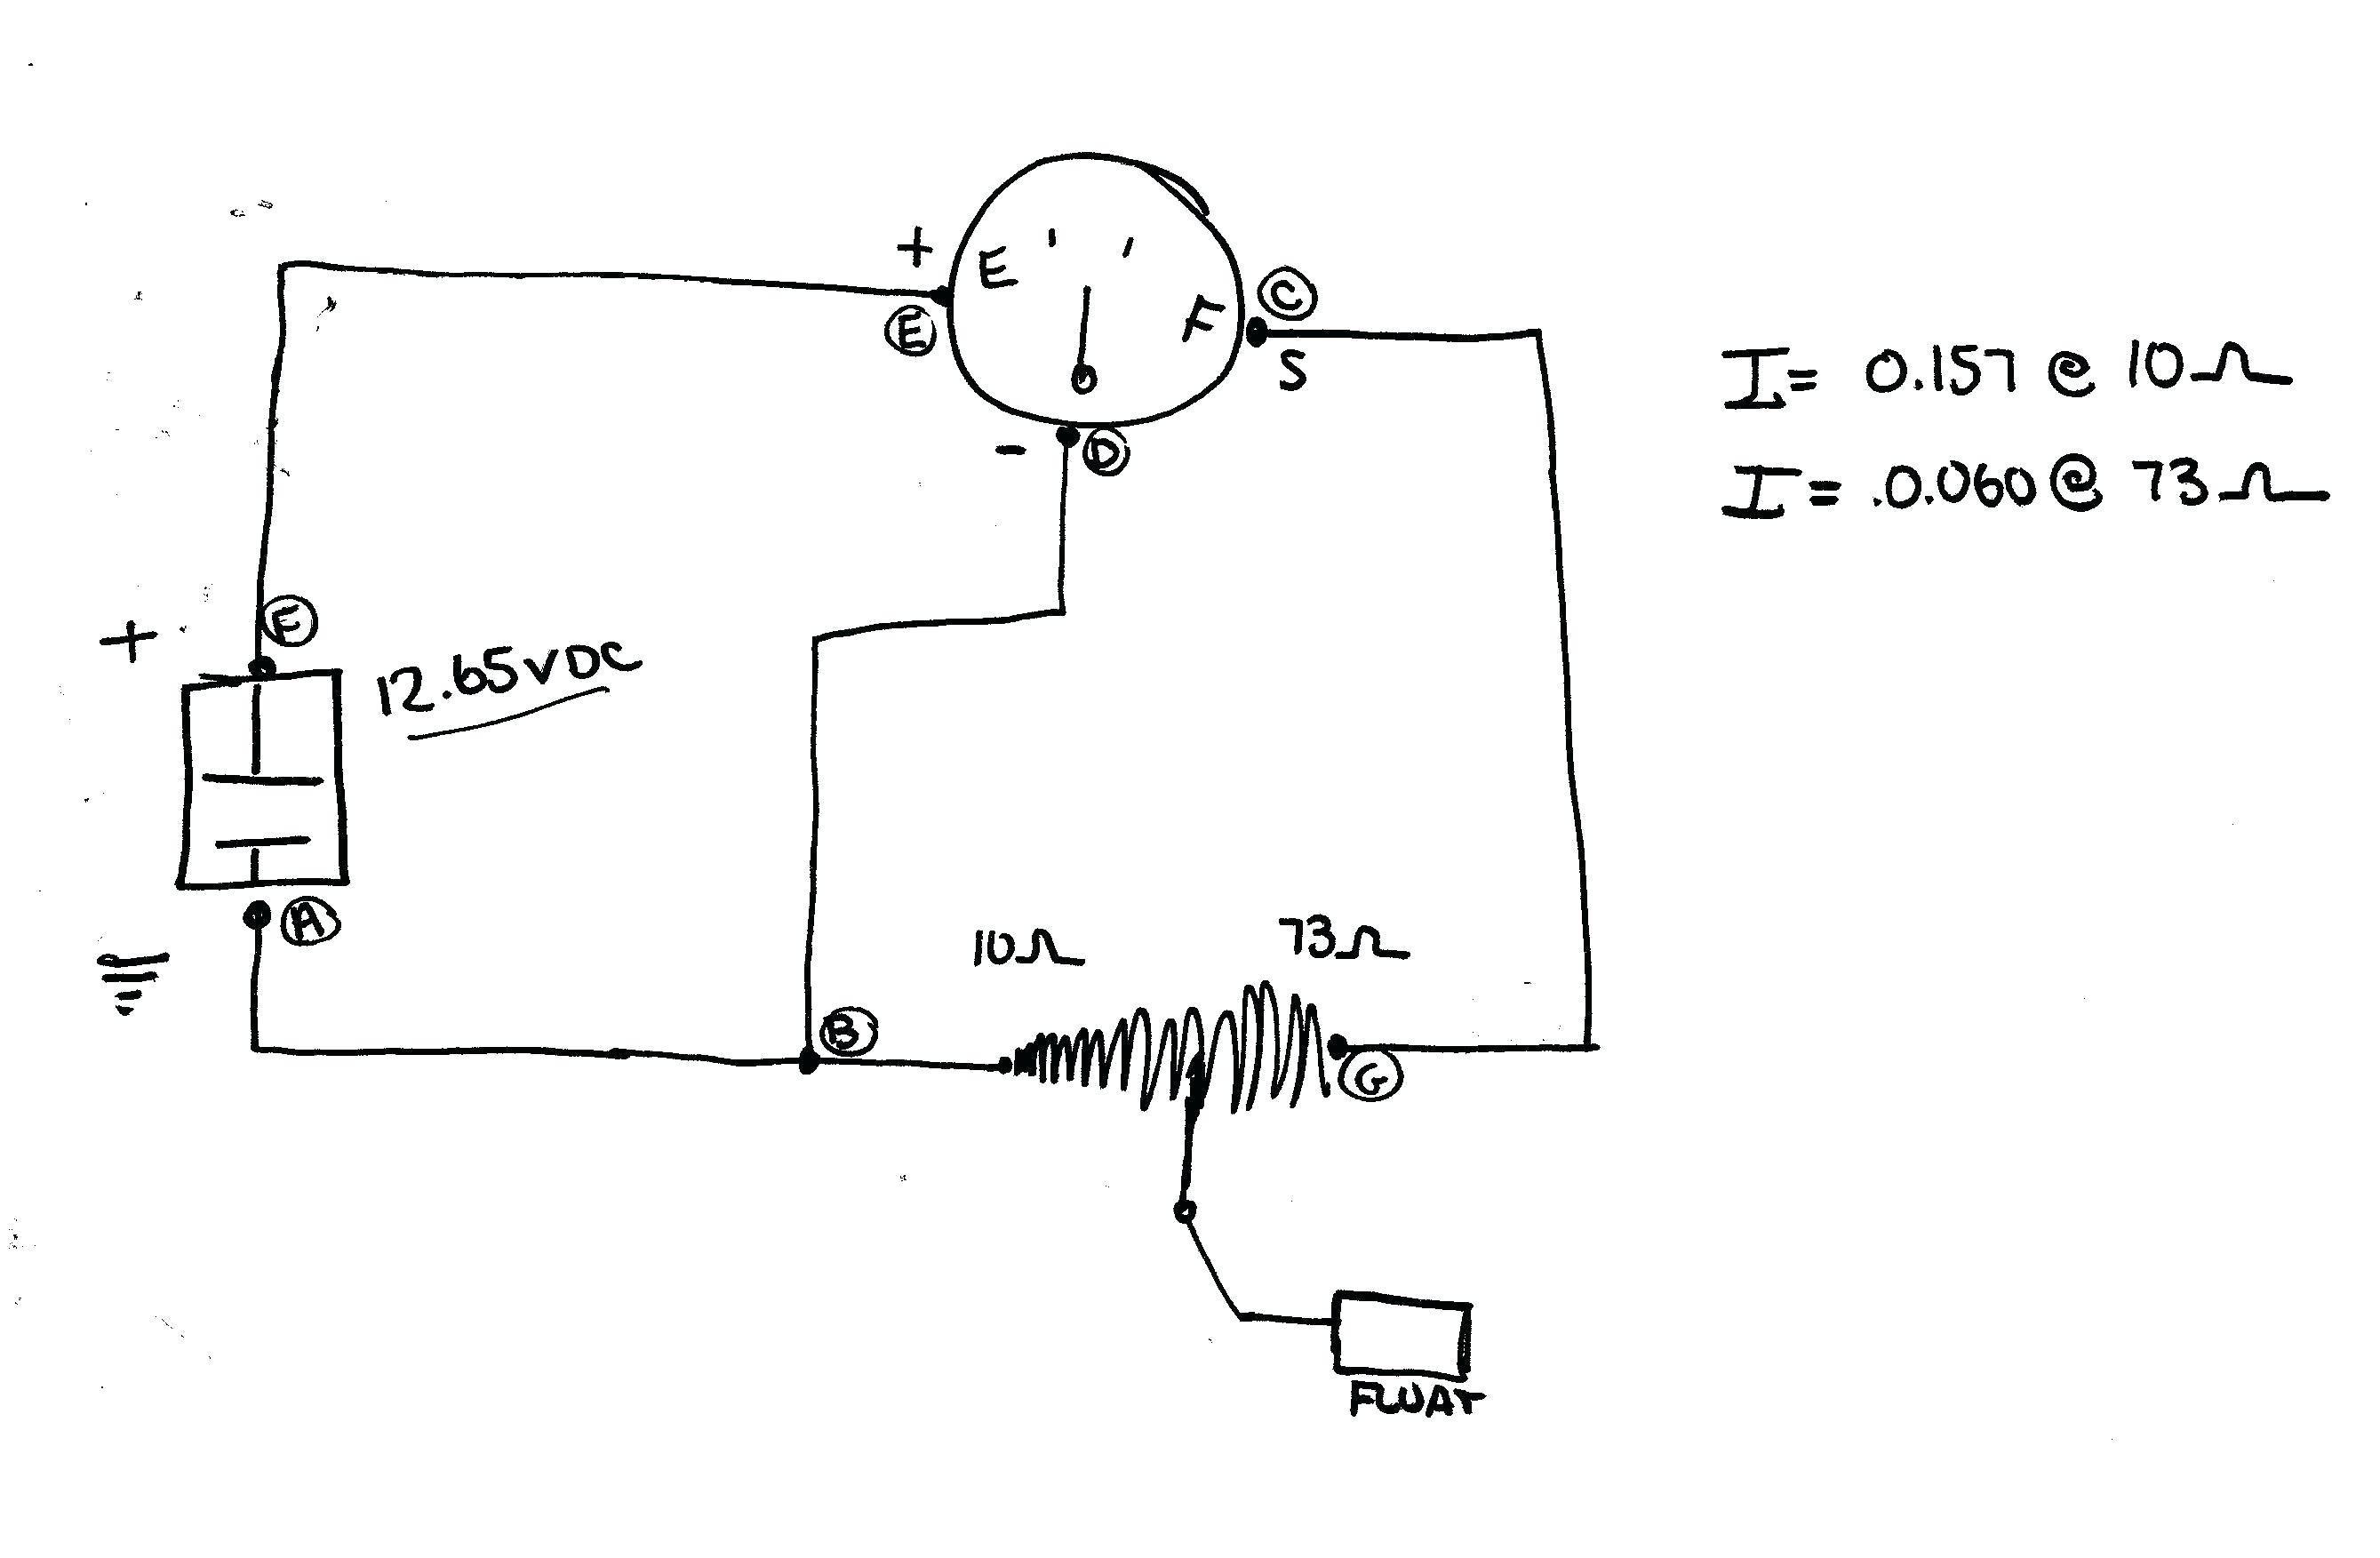 Gmc Fuel Tank Sending Unit Diagram | Wiring Diagram - Gm Fuel Sending Unit Wiring Diagram